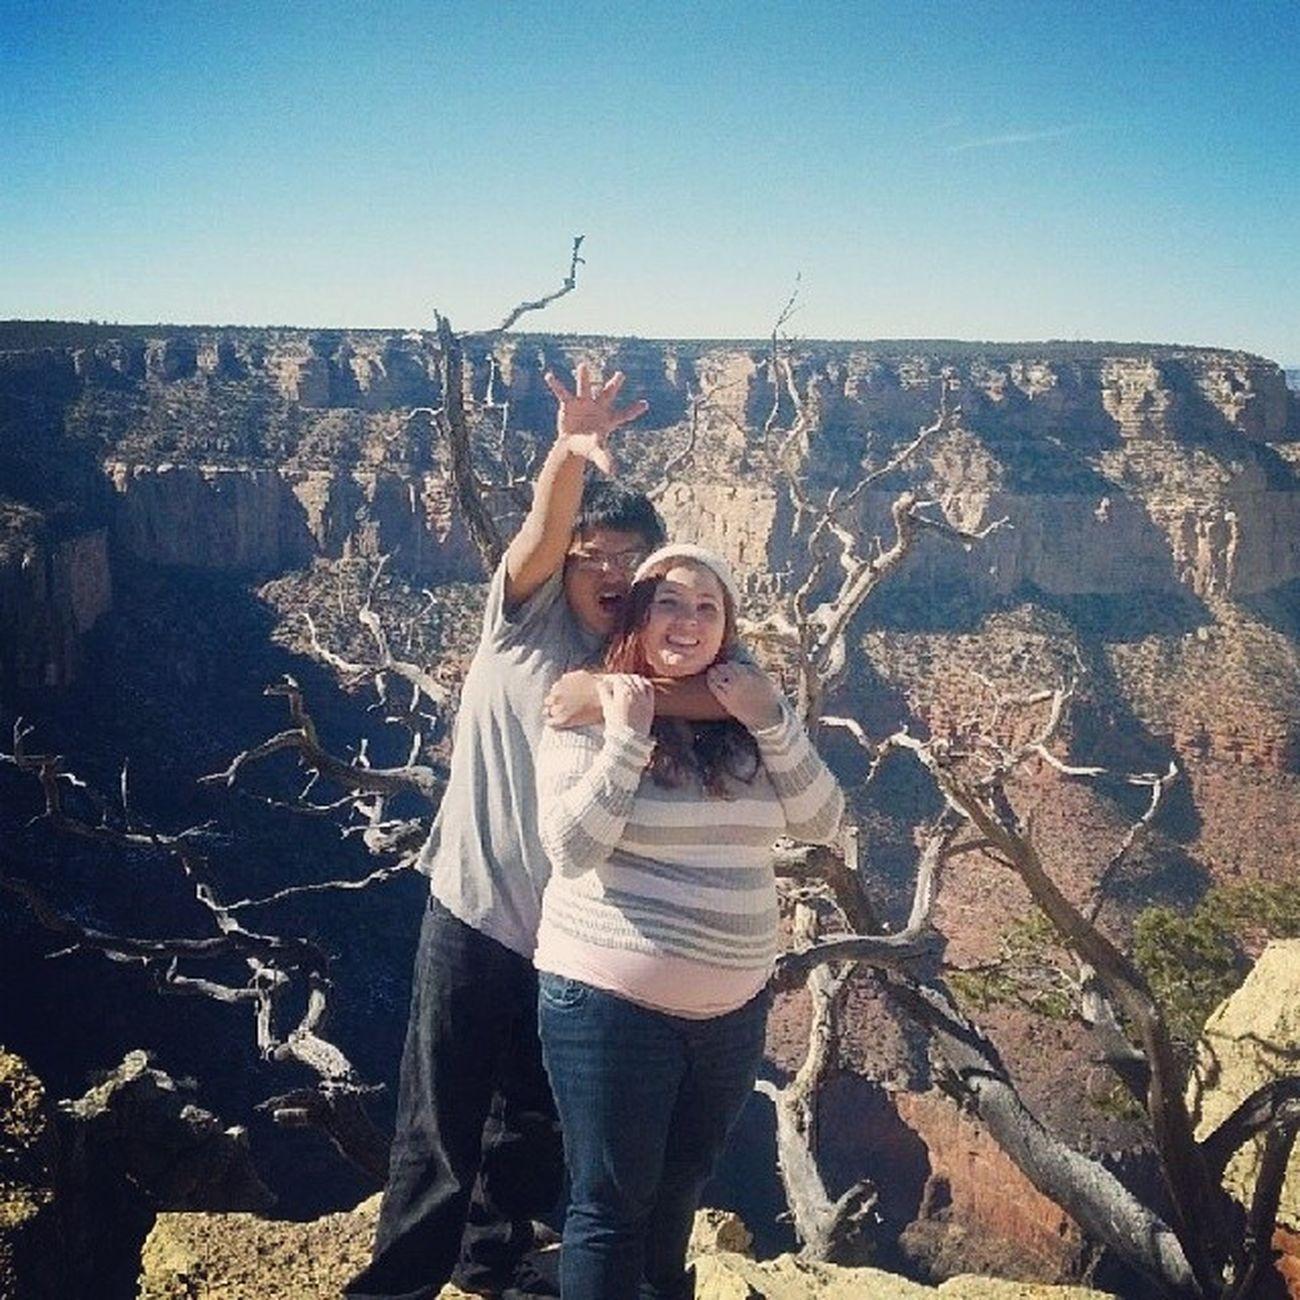 Whatwhat Roadtrip Couplesweekend Mountains canyon grandcanyon grandcanyonvillage arizona az roadtrip couplesweekend mountains canyon coloradoriver navajo native nativeamerican cheyenne apache sioux whitegirl tyler katlynn tk